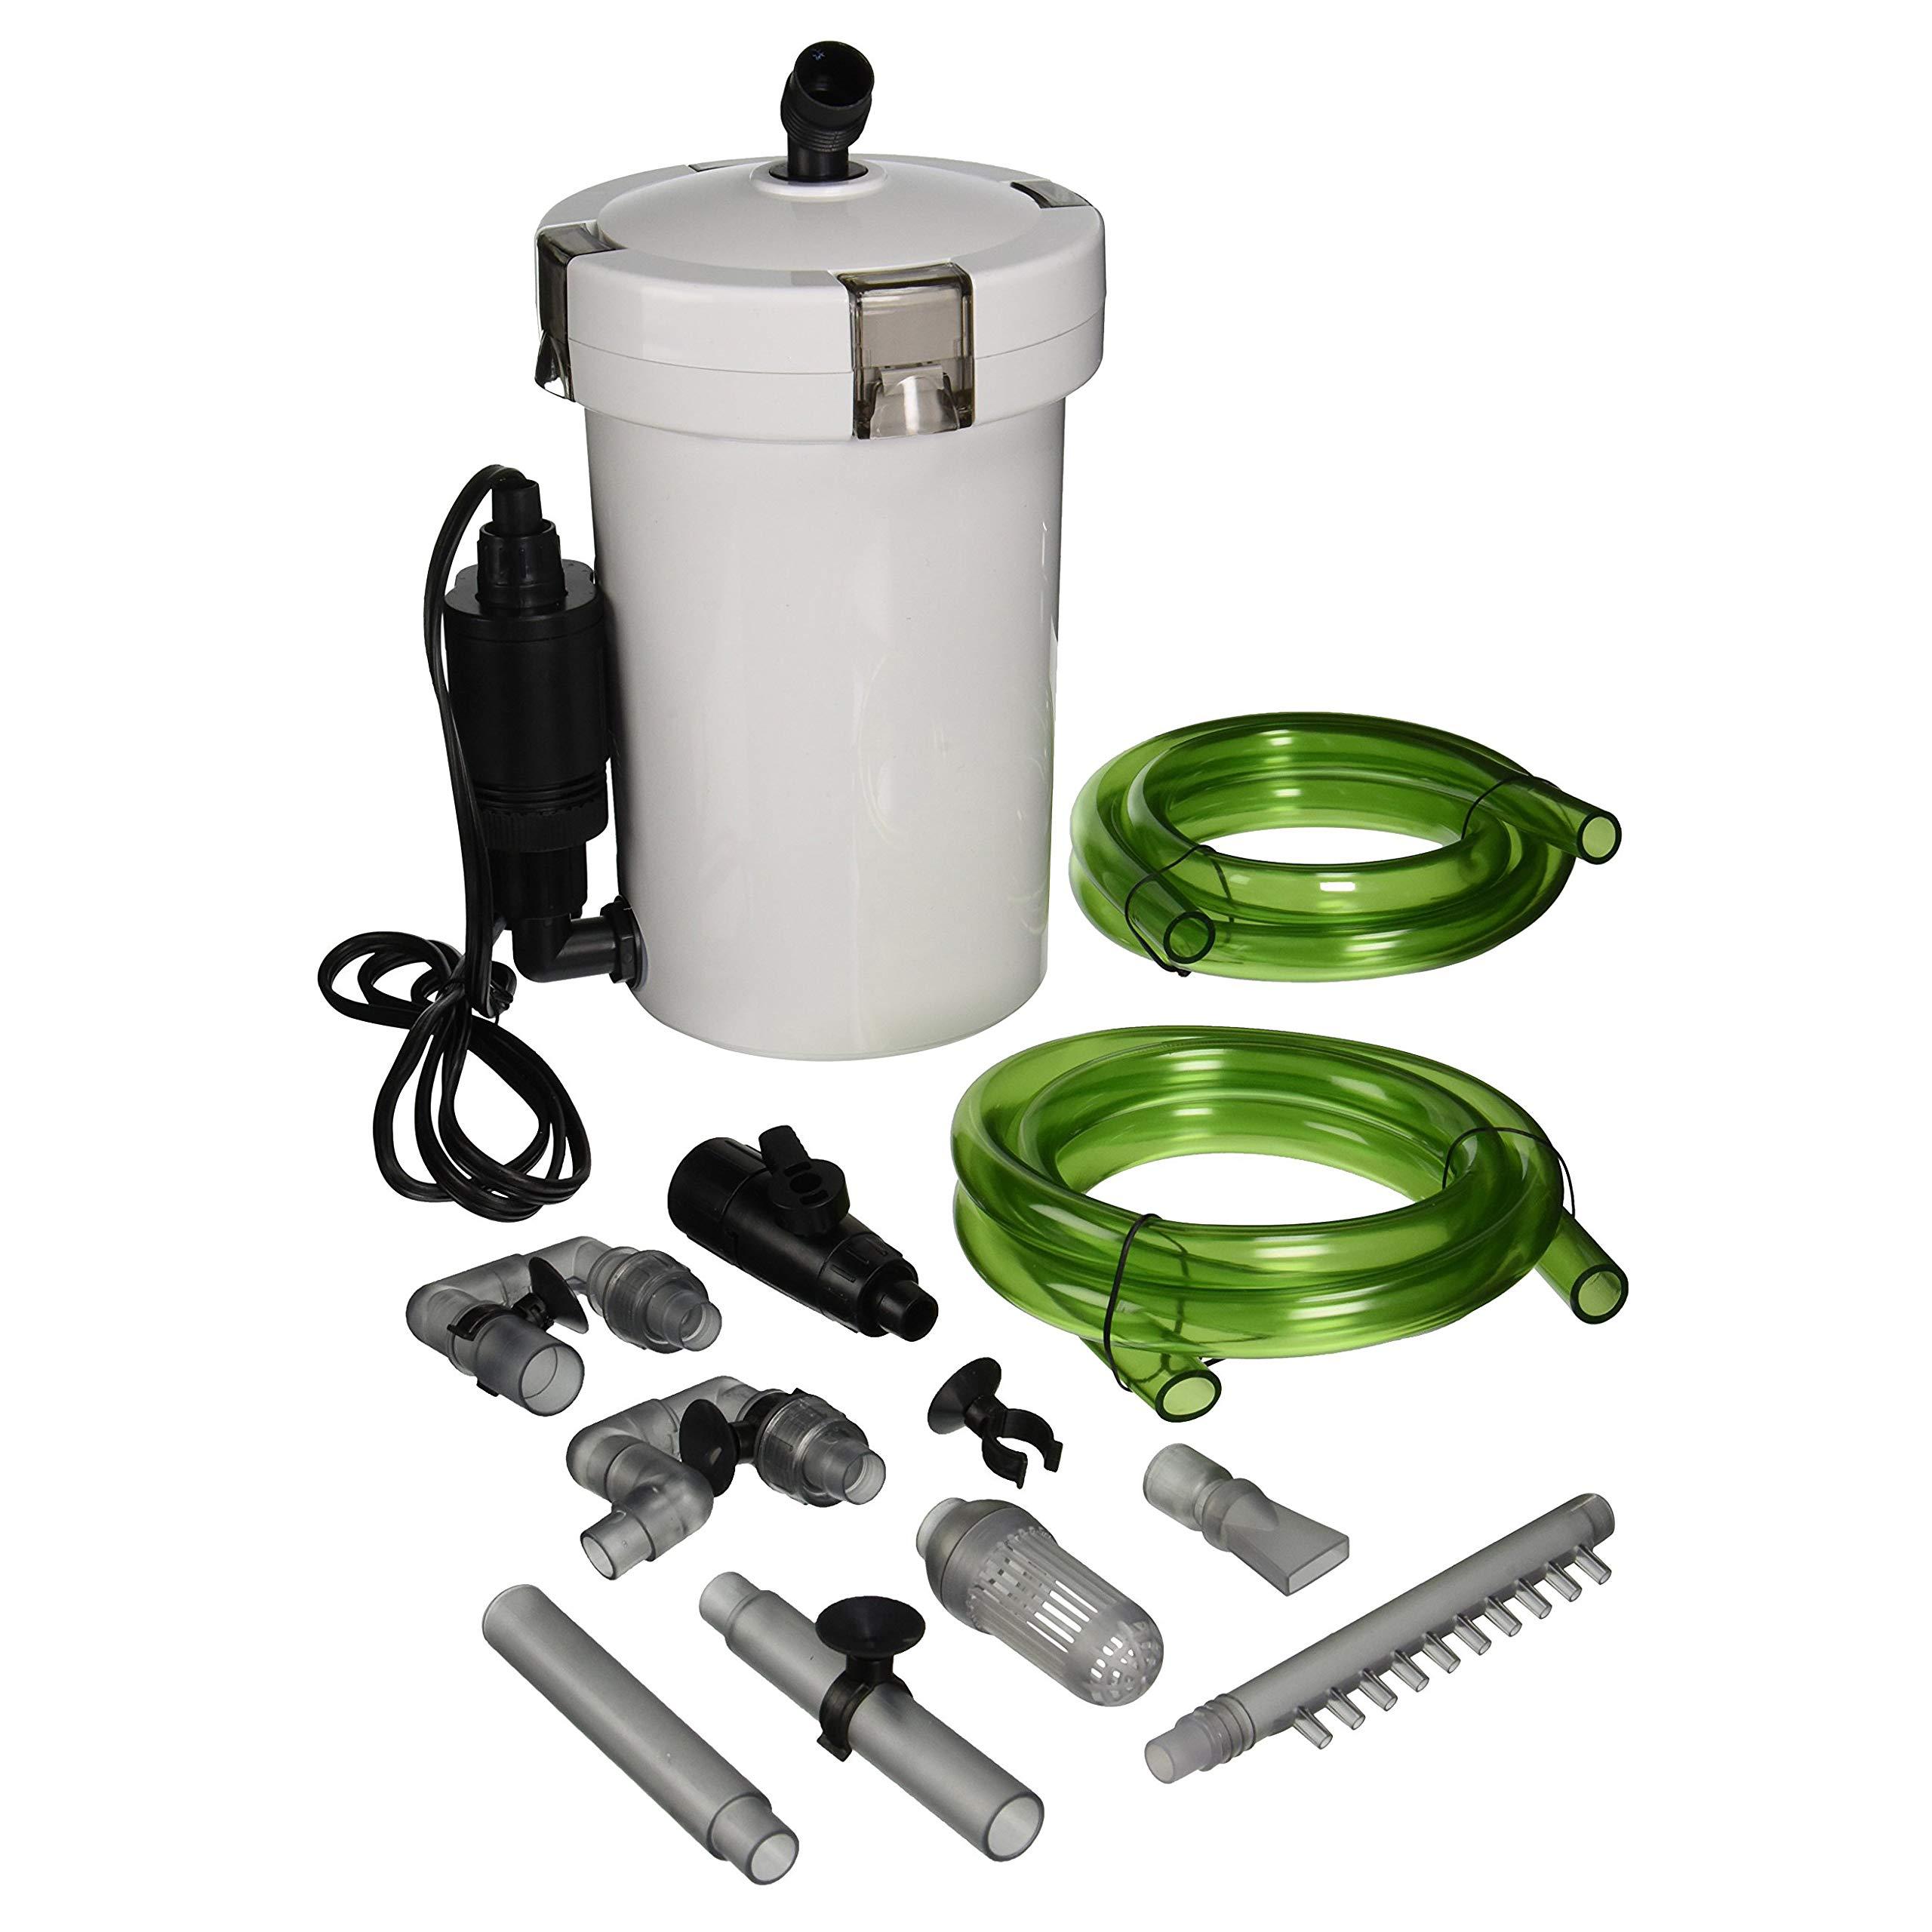 SunSun Tech'n'Toy HW-603B 106 GPH 3-Stage External Canister Filter